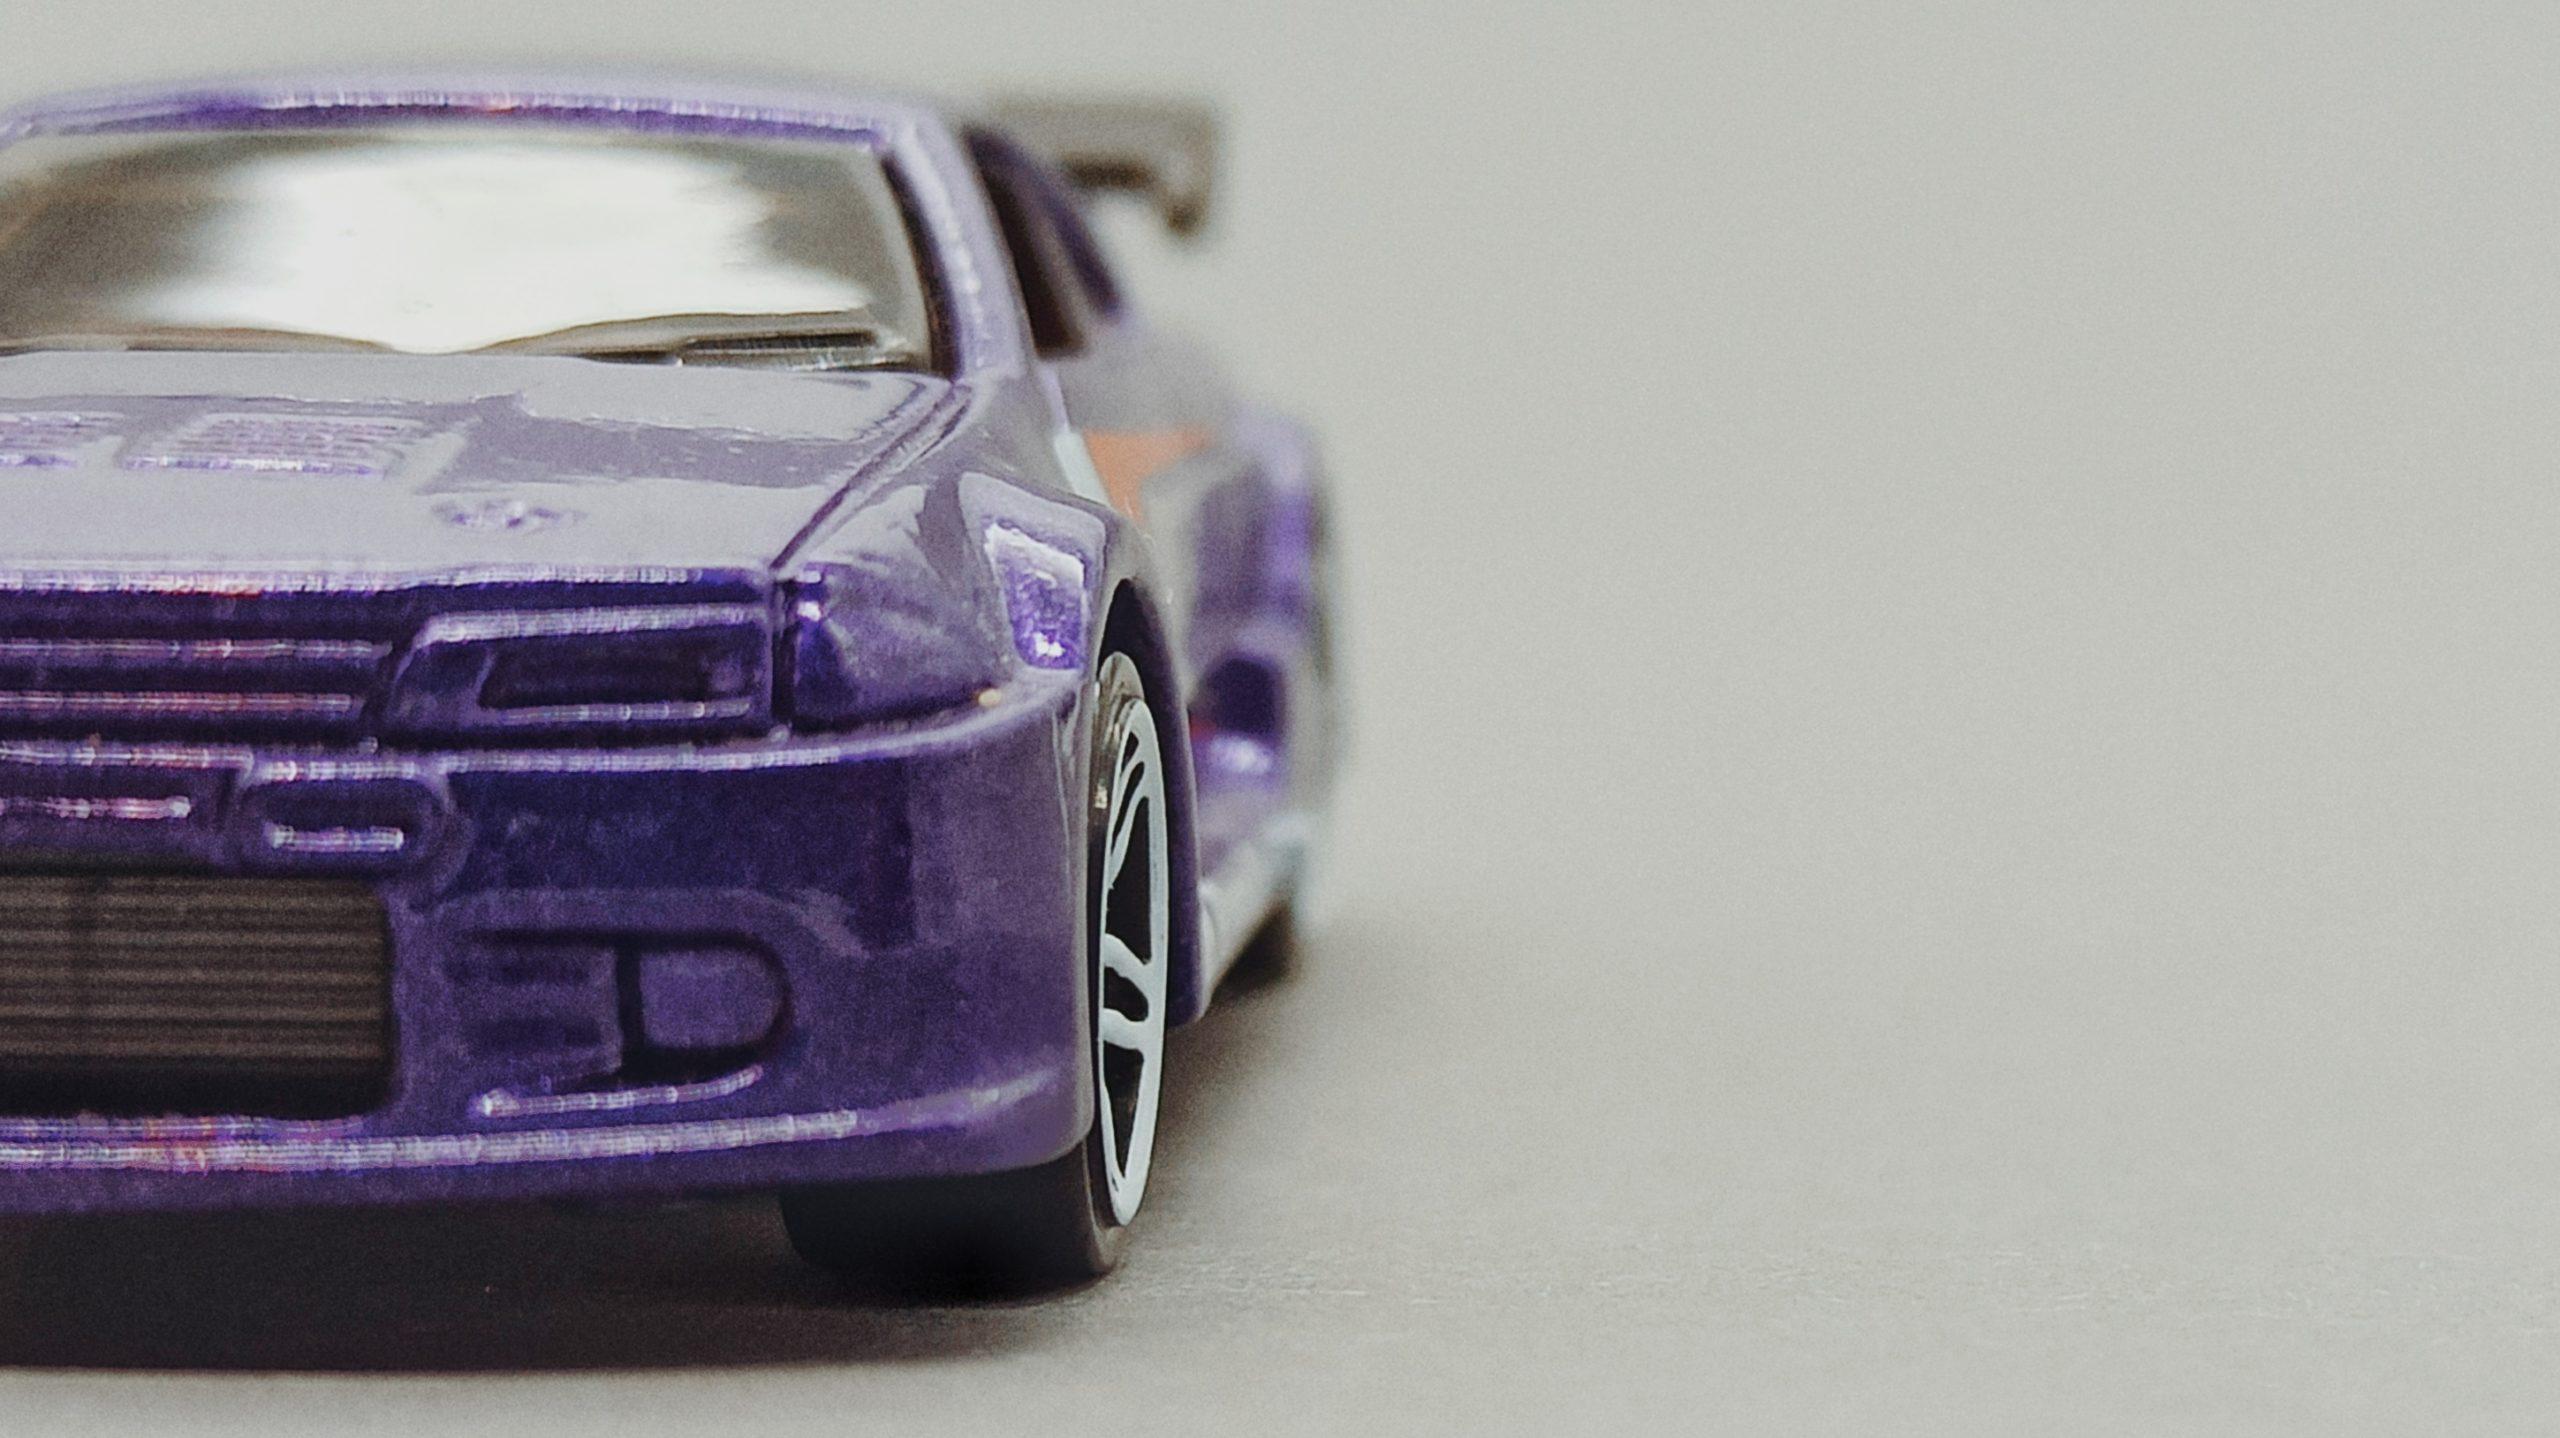 Hot Wheels Nissan Skyline (V0104) 2011 Racing Kits: Street Race (3/12) purple front angle